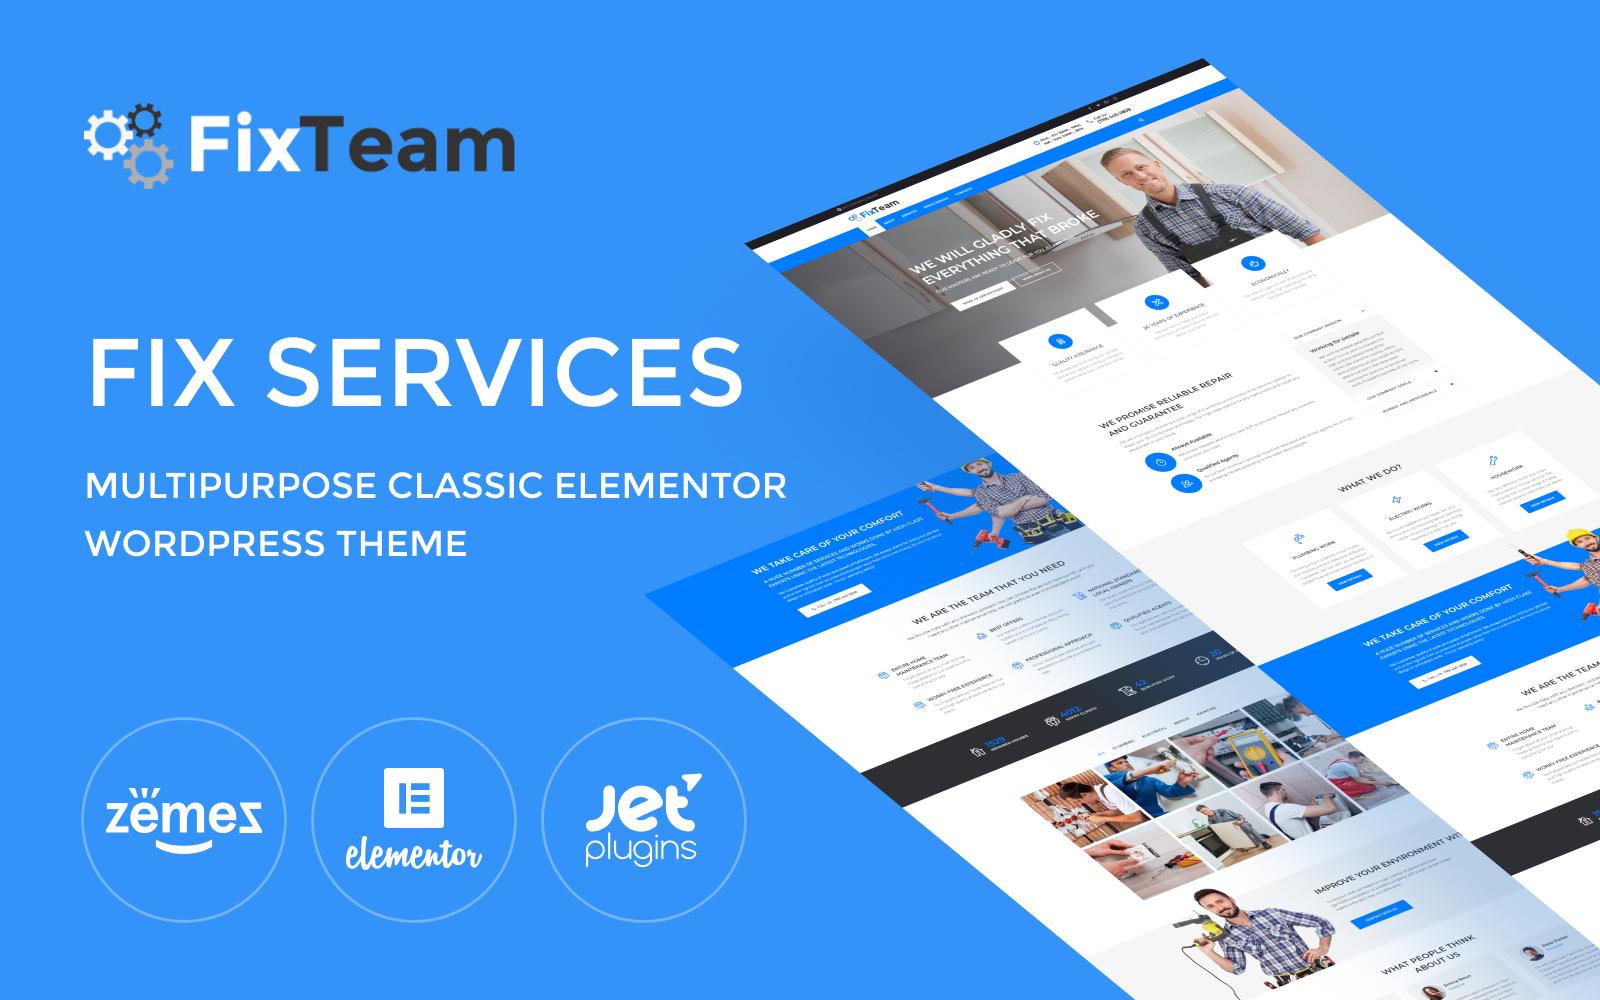 FixTeam - Fix Services Multipurpose Classic Elementor №76462